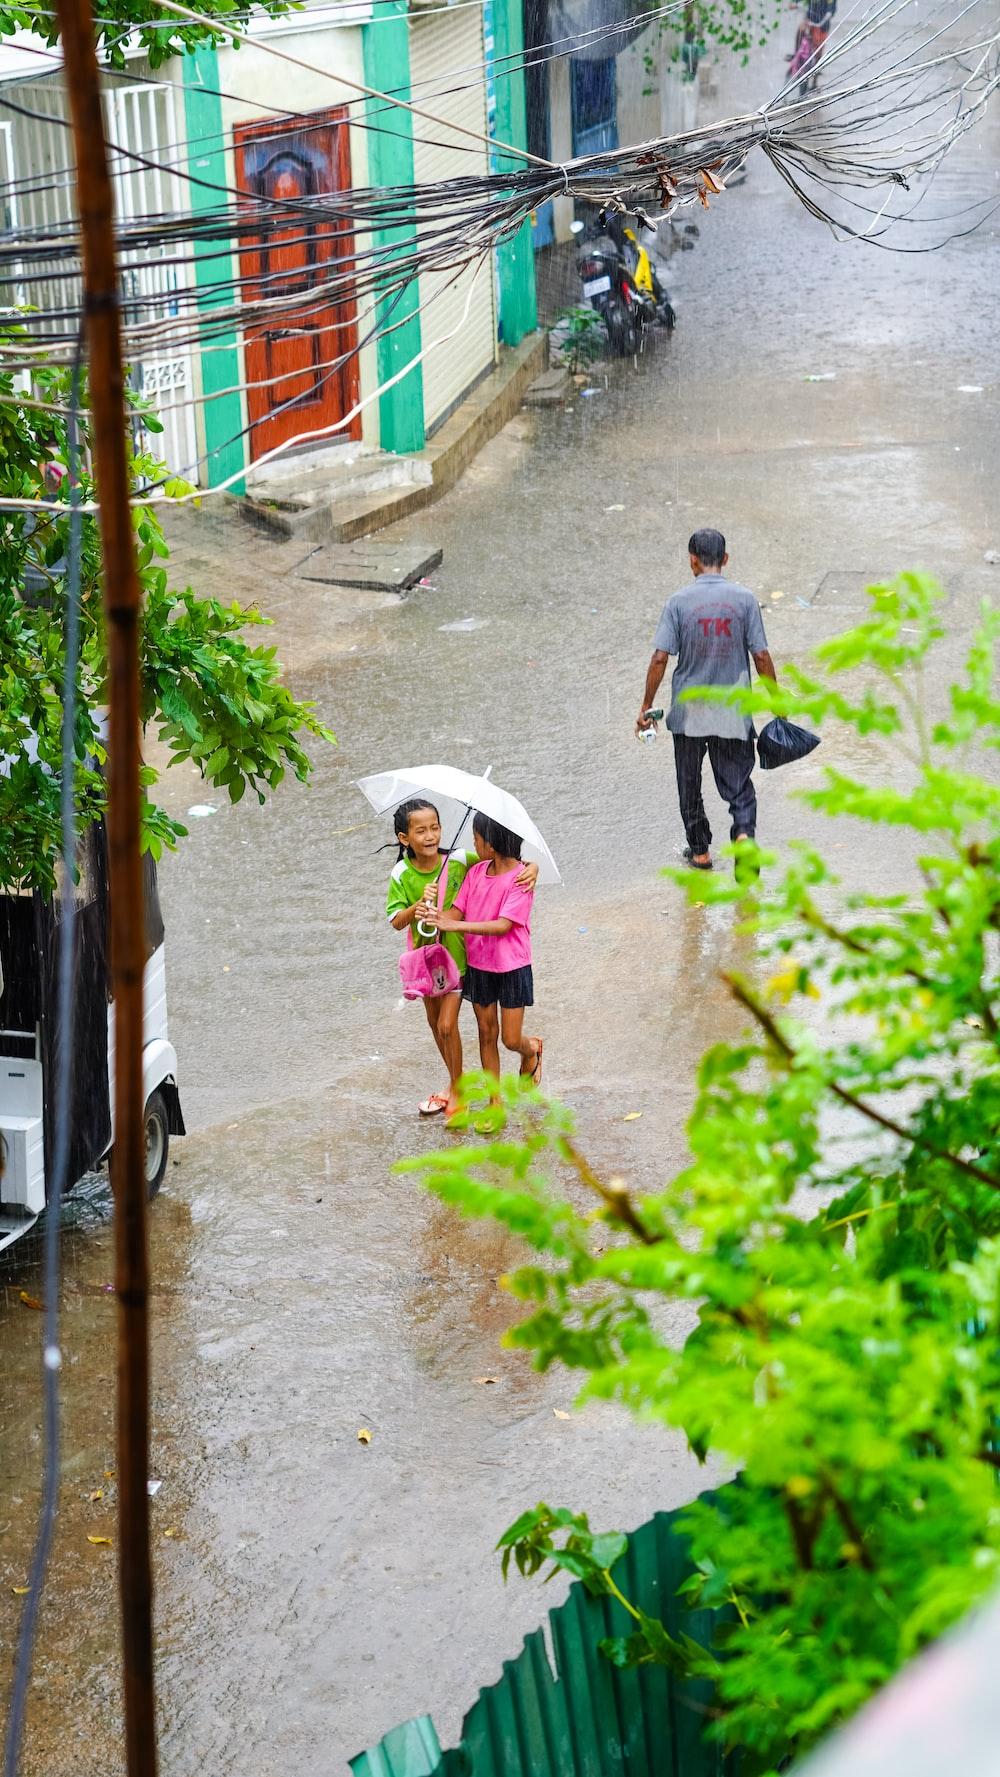 2 boys walking on sidewalk holding umbrella during daytime